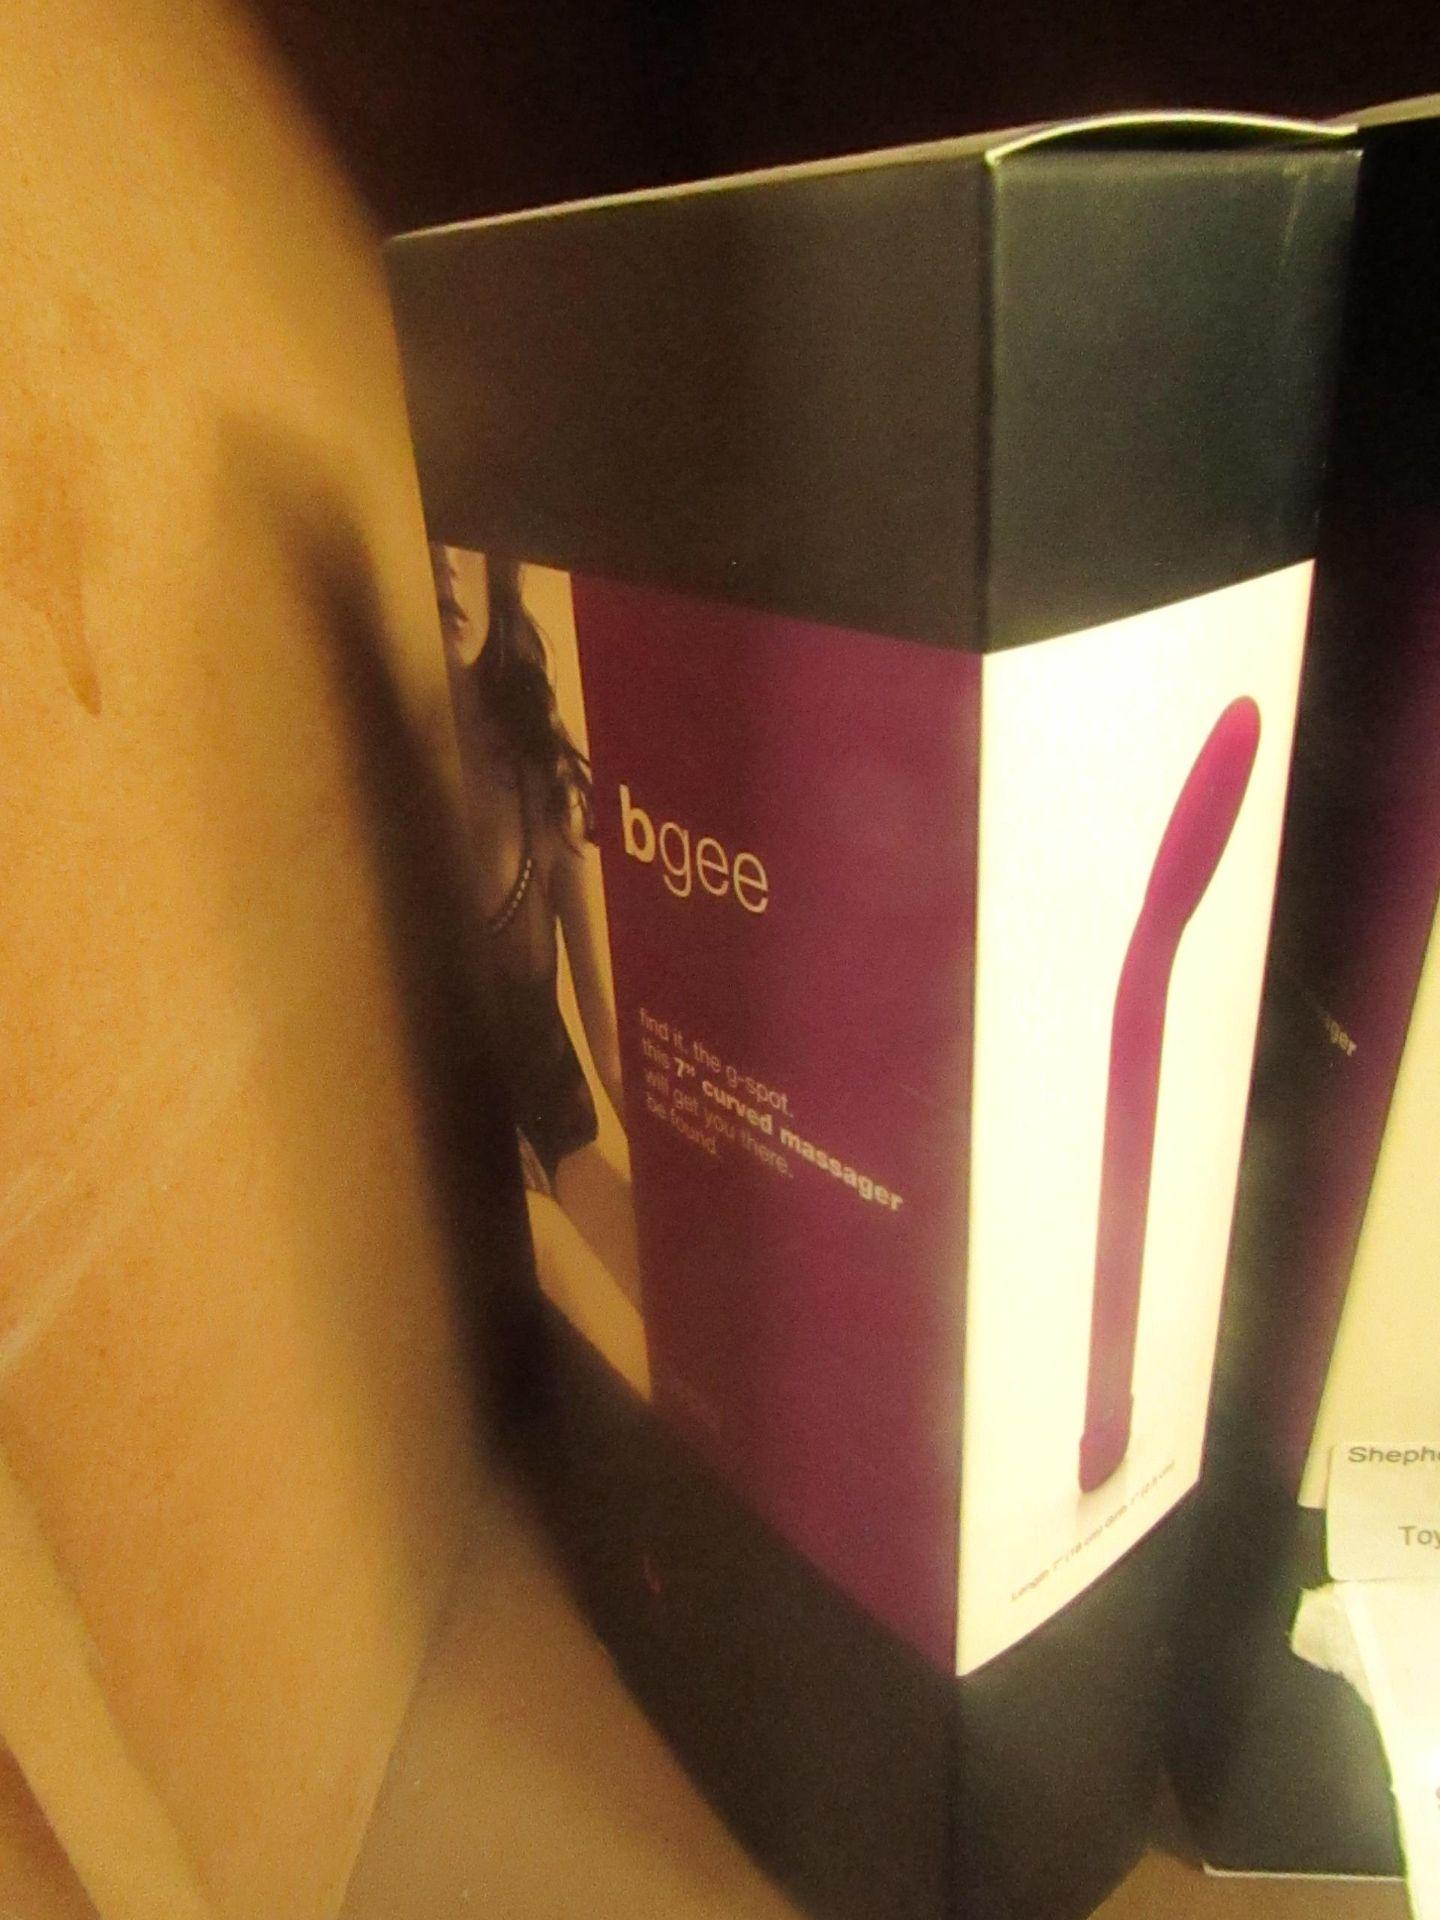 "Bswish Bnaughty 7"" Waterproof Massager - Purple - 7""x2.5"""